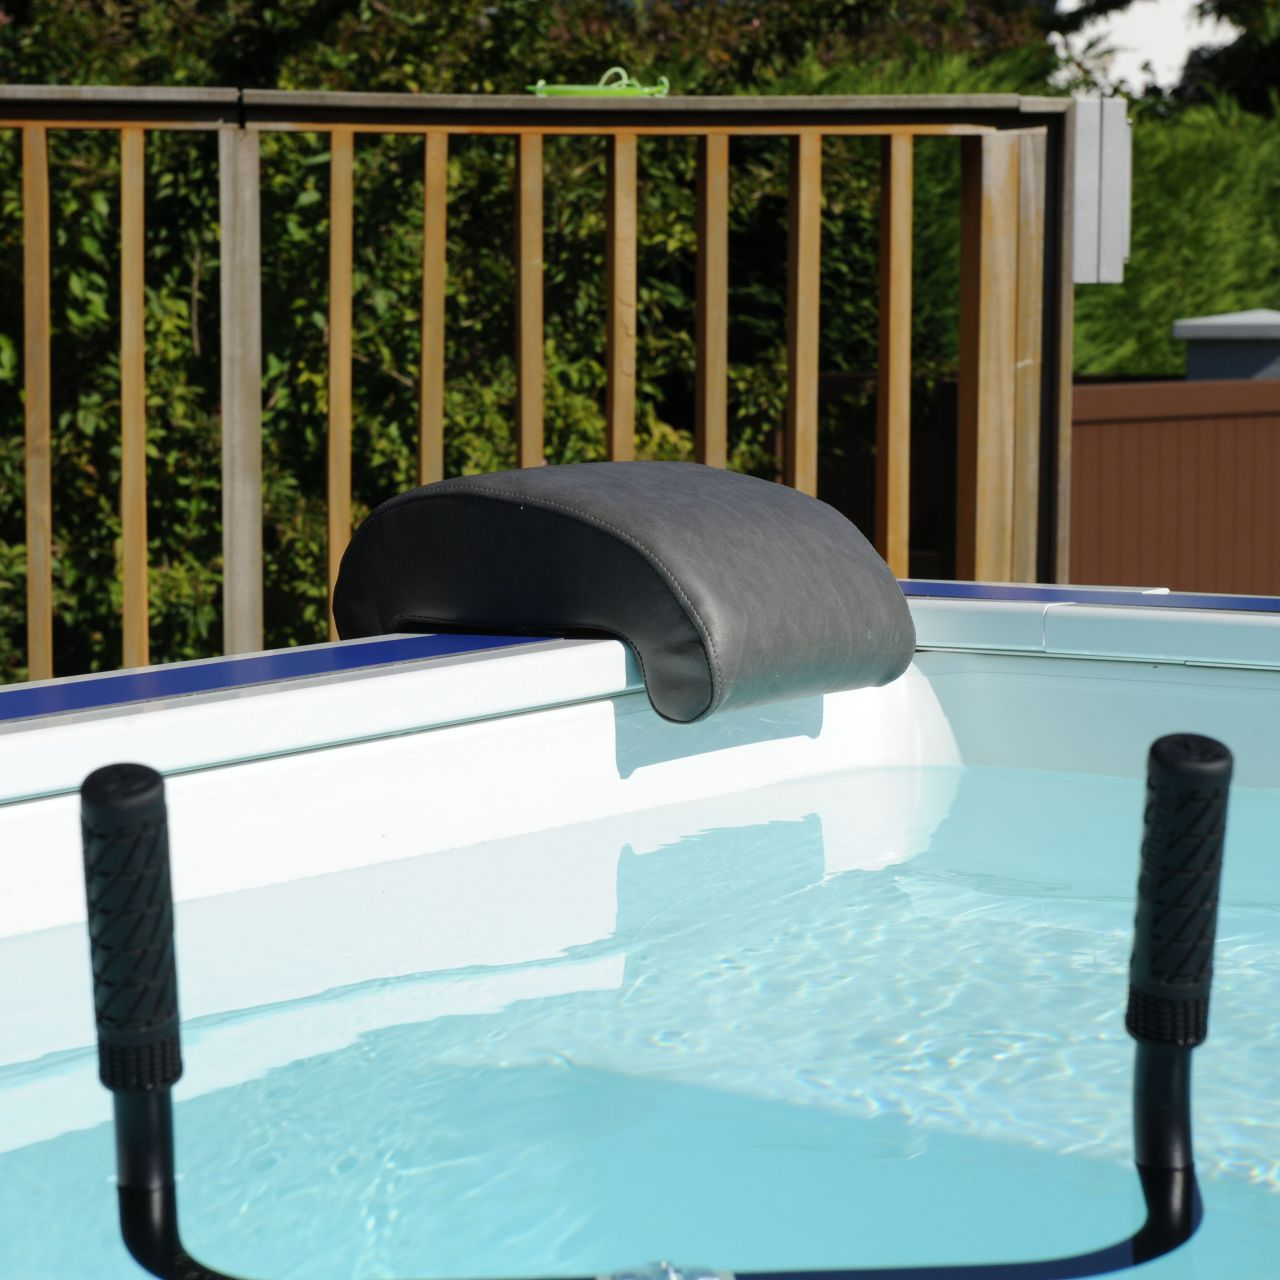 doodoopool prix kit piscine enterre pas cher kit piscine enterre pas cher piscine enterre prix. Black Bedroom Furniture Sets. Home Design Ideas